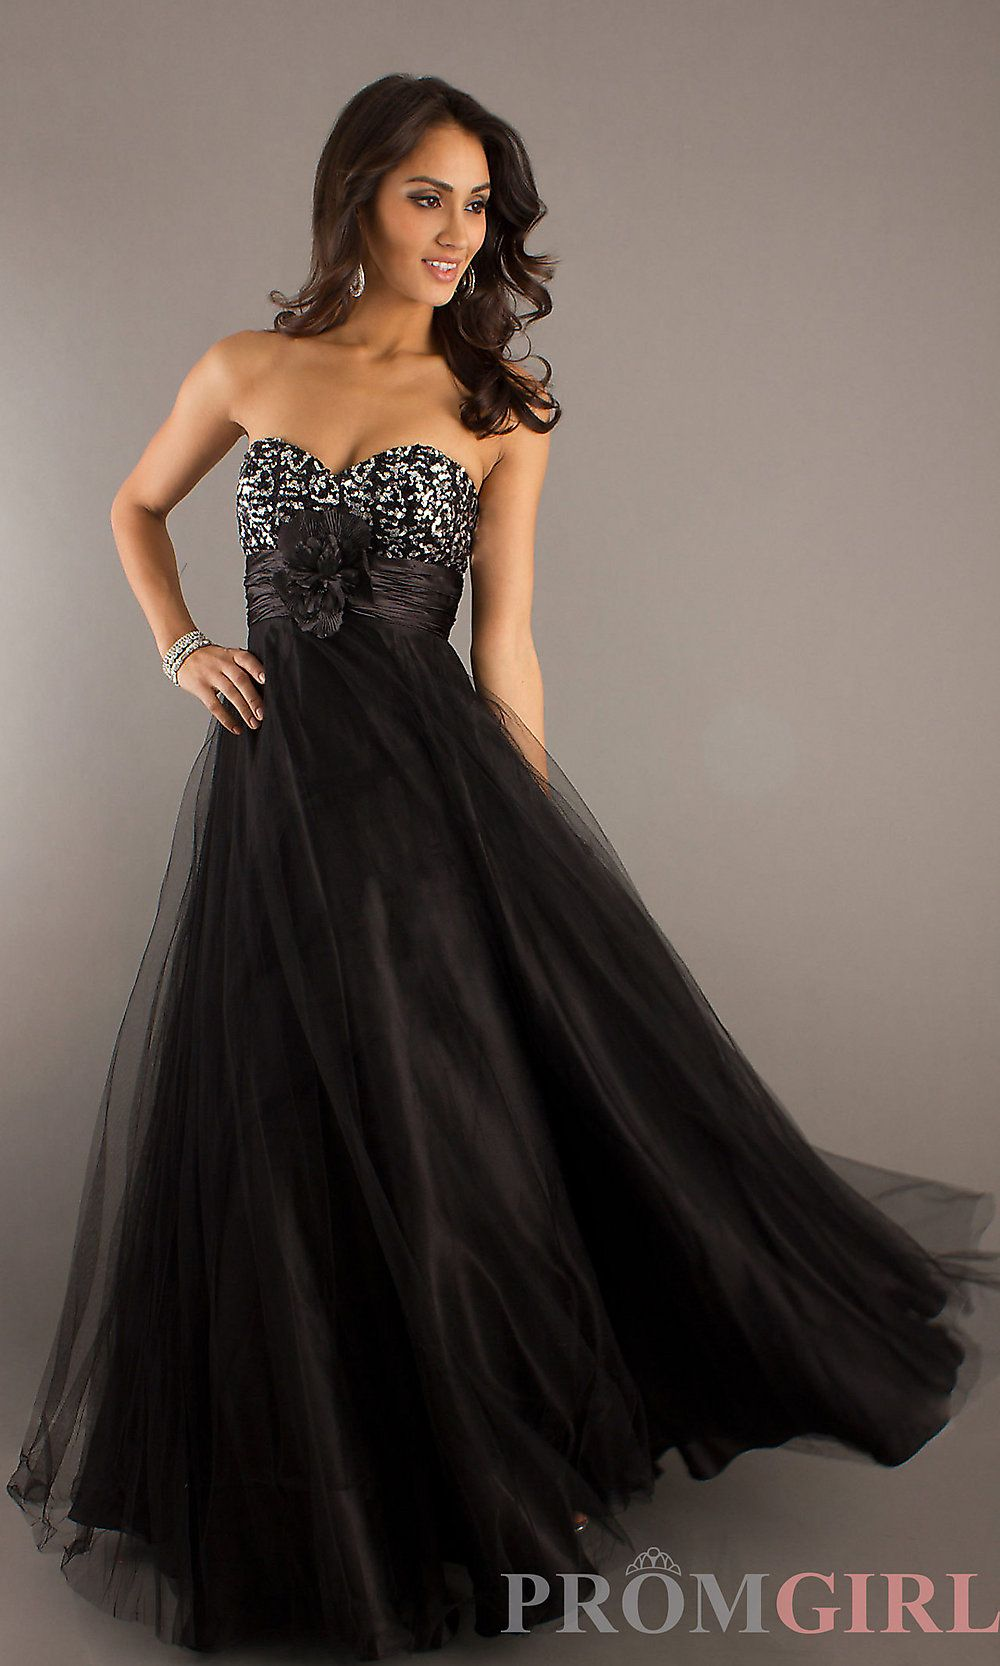 Full Length Strapless Formal Gown Flowy Prom Dresses Dresses Formal Dresses [ 1666 x 1000 Pixel ]